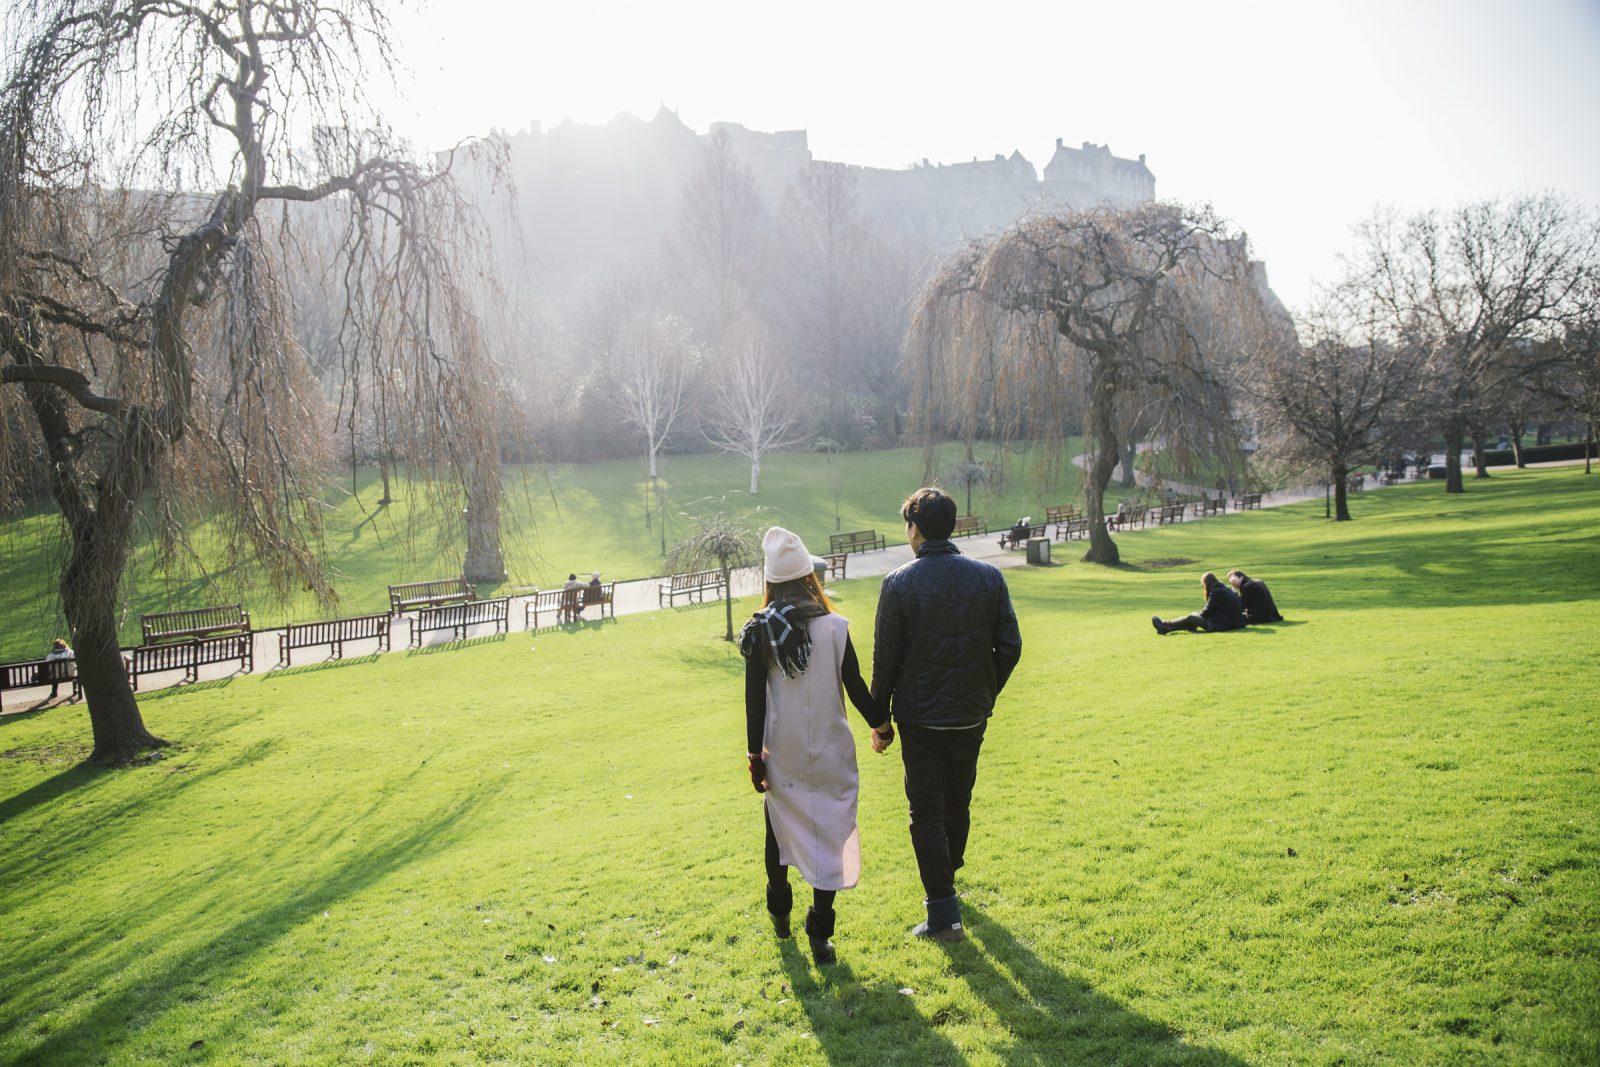 Edinburgh Casual Engagement Photoshoot and Couple Holiday Photographer by Ceranna Photography